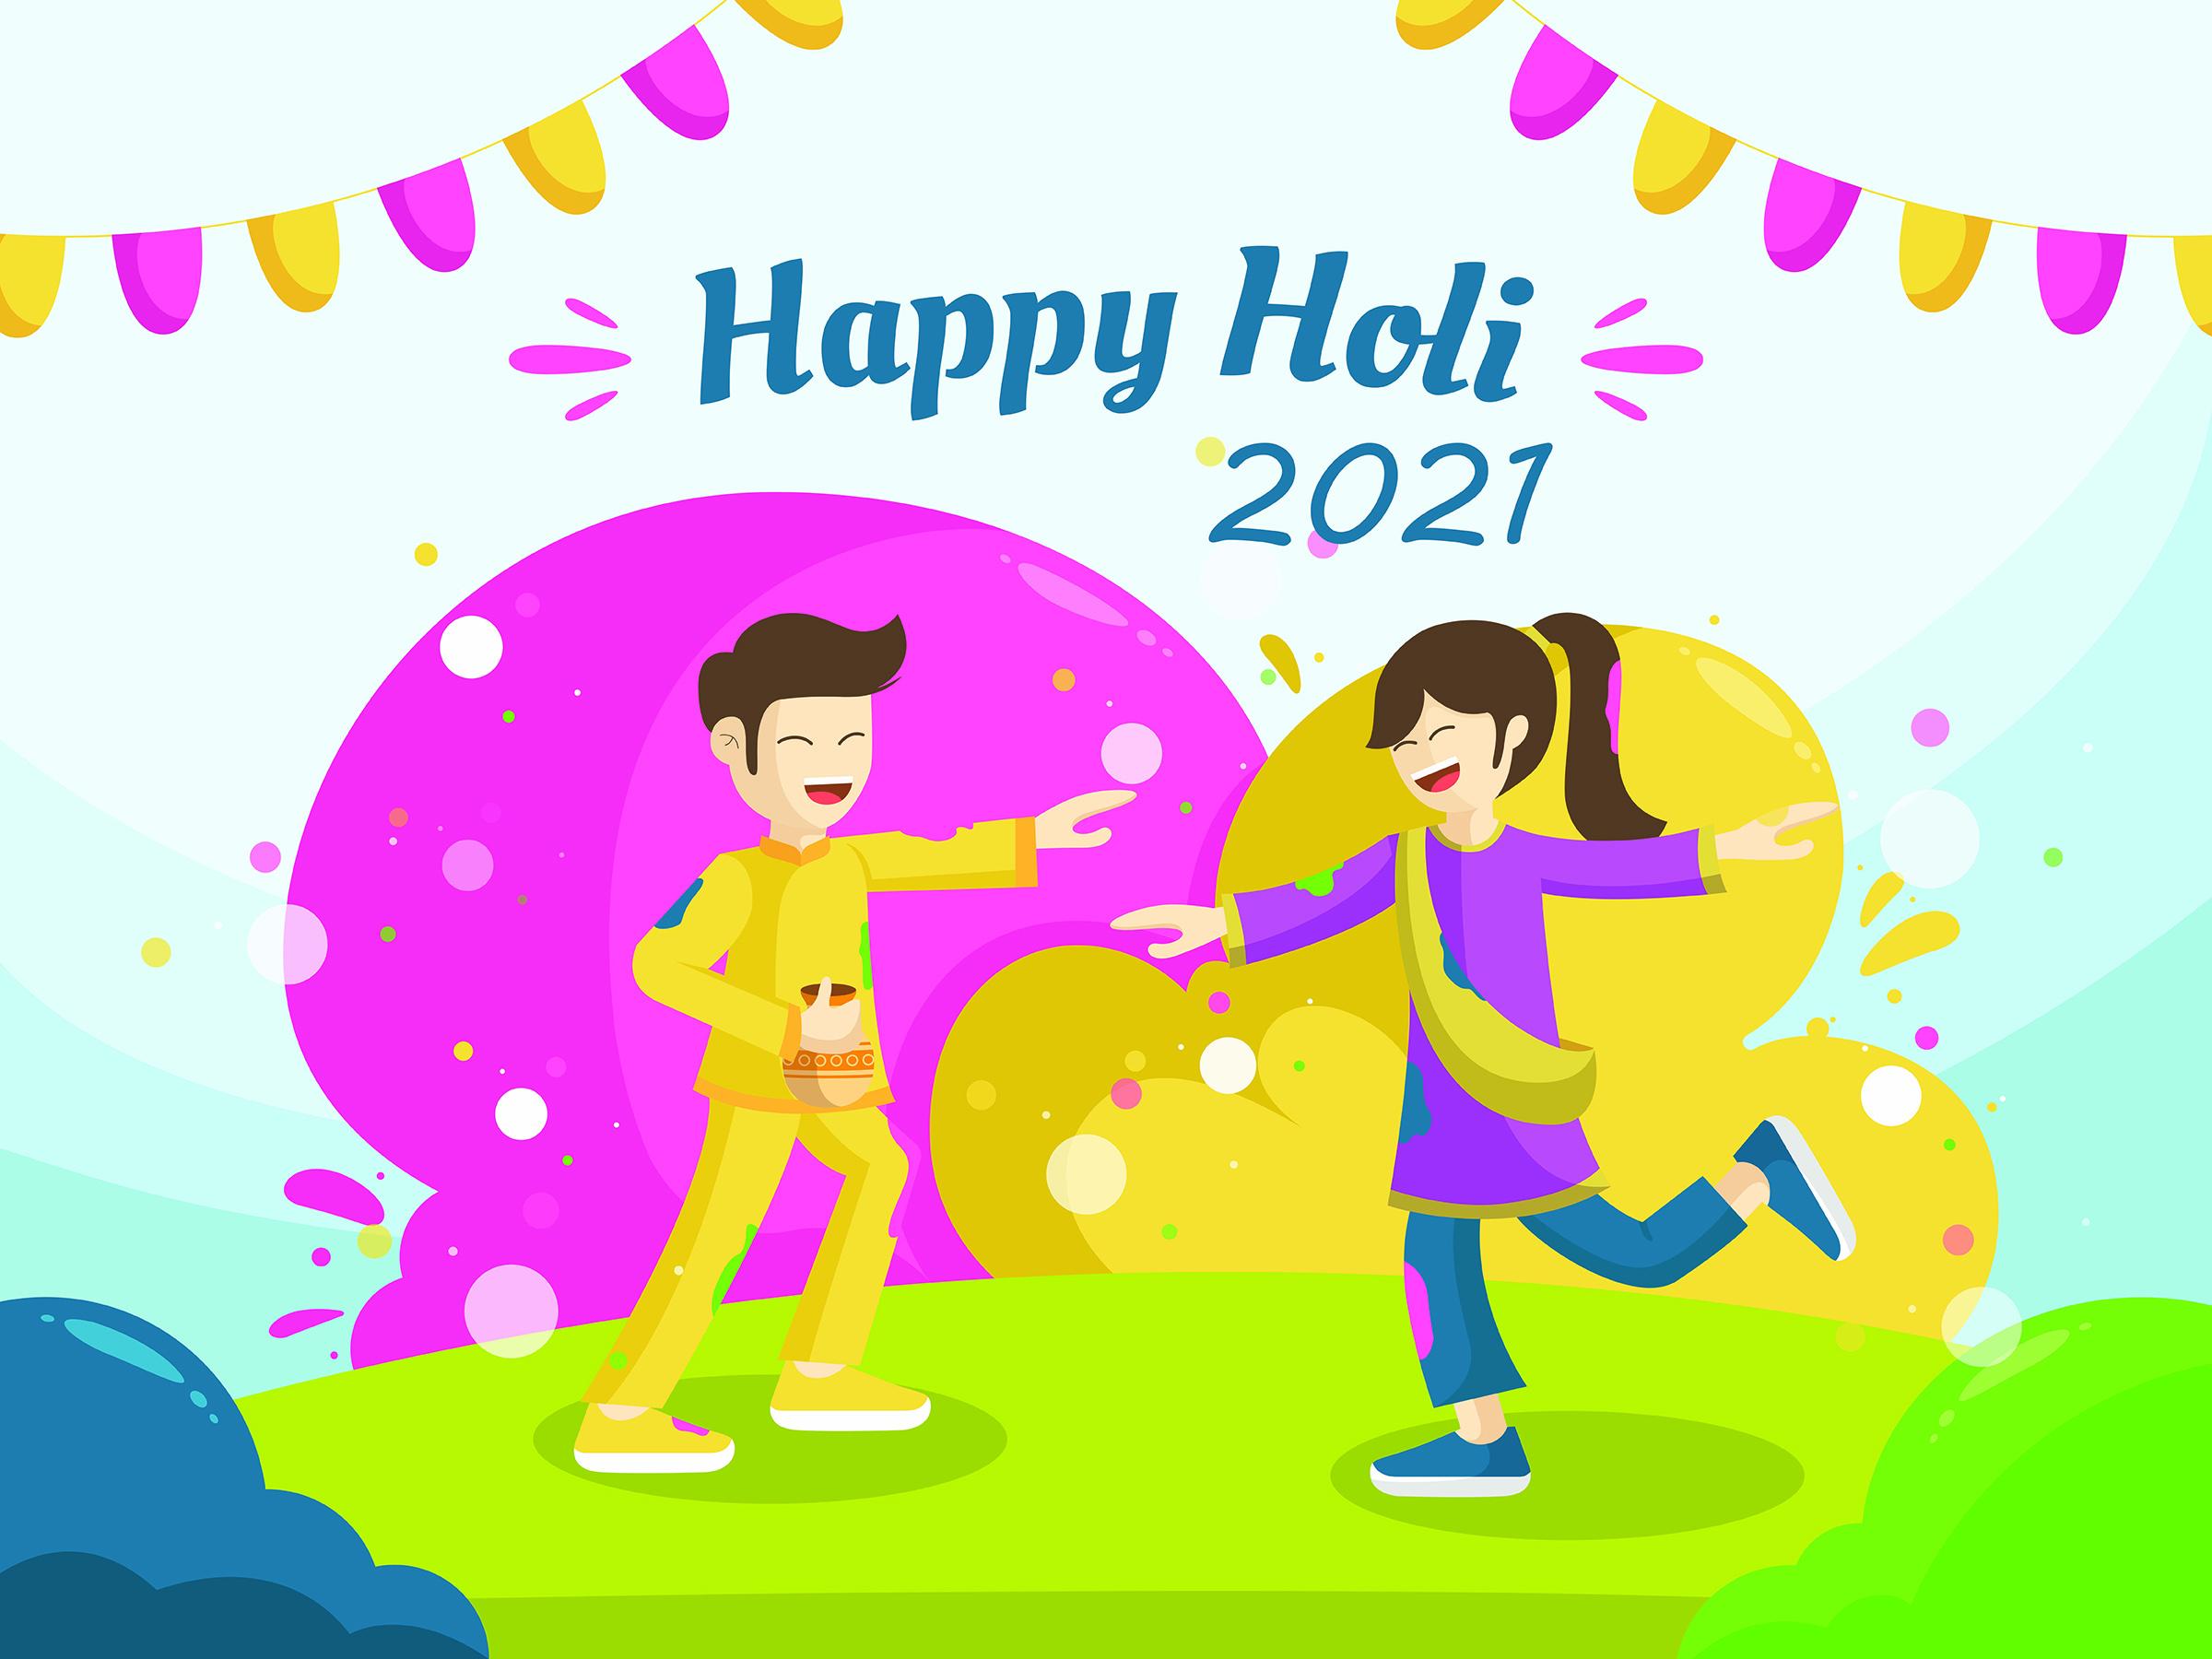 Happy Holi 2021 Illustrations